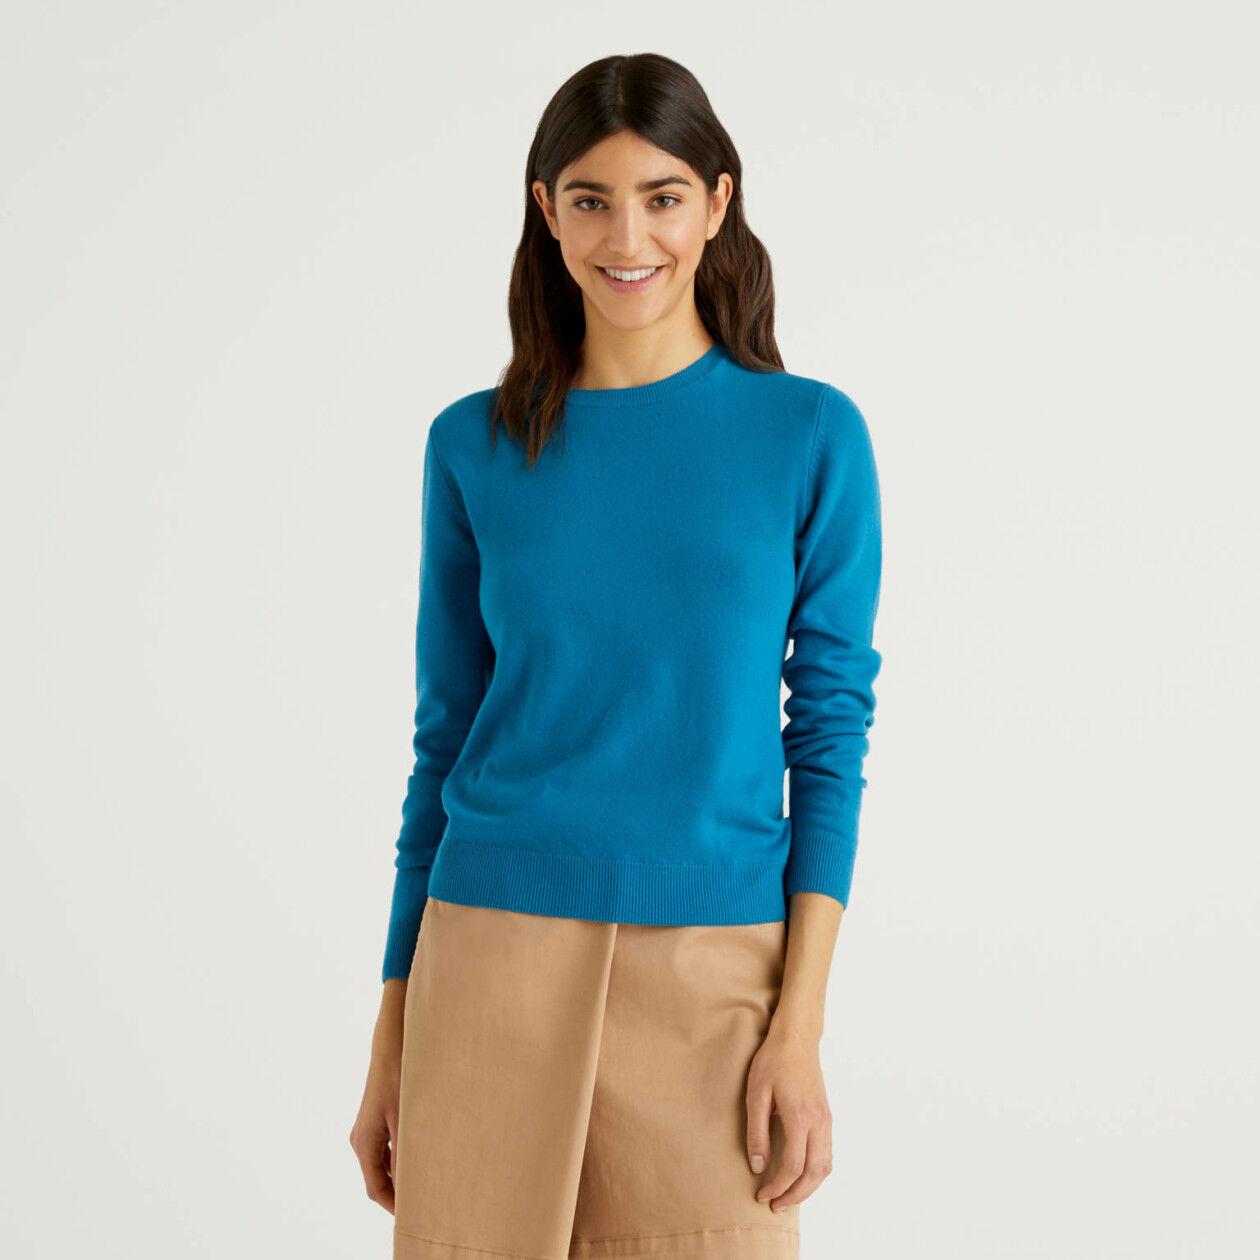 Teal crew neck sweater in pure virgin wool